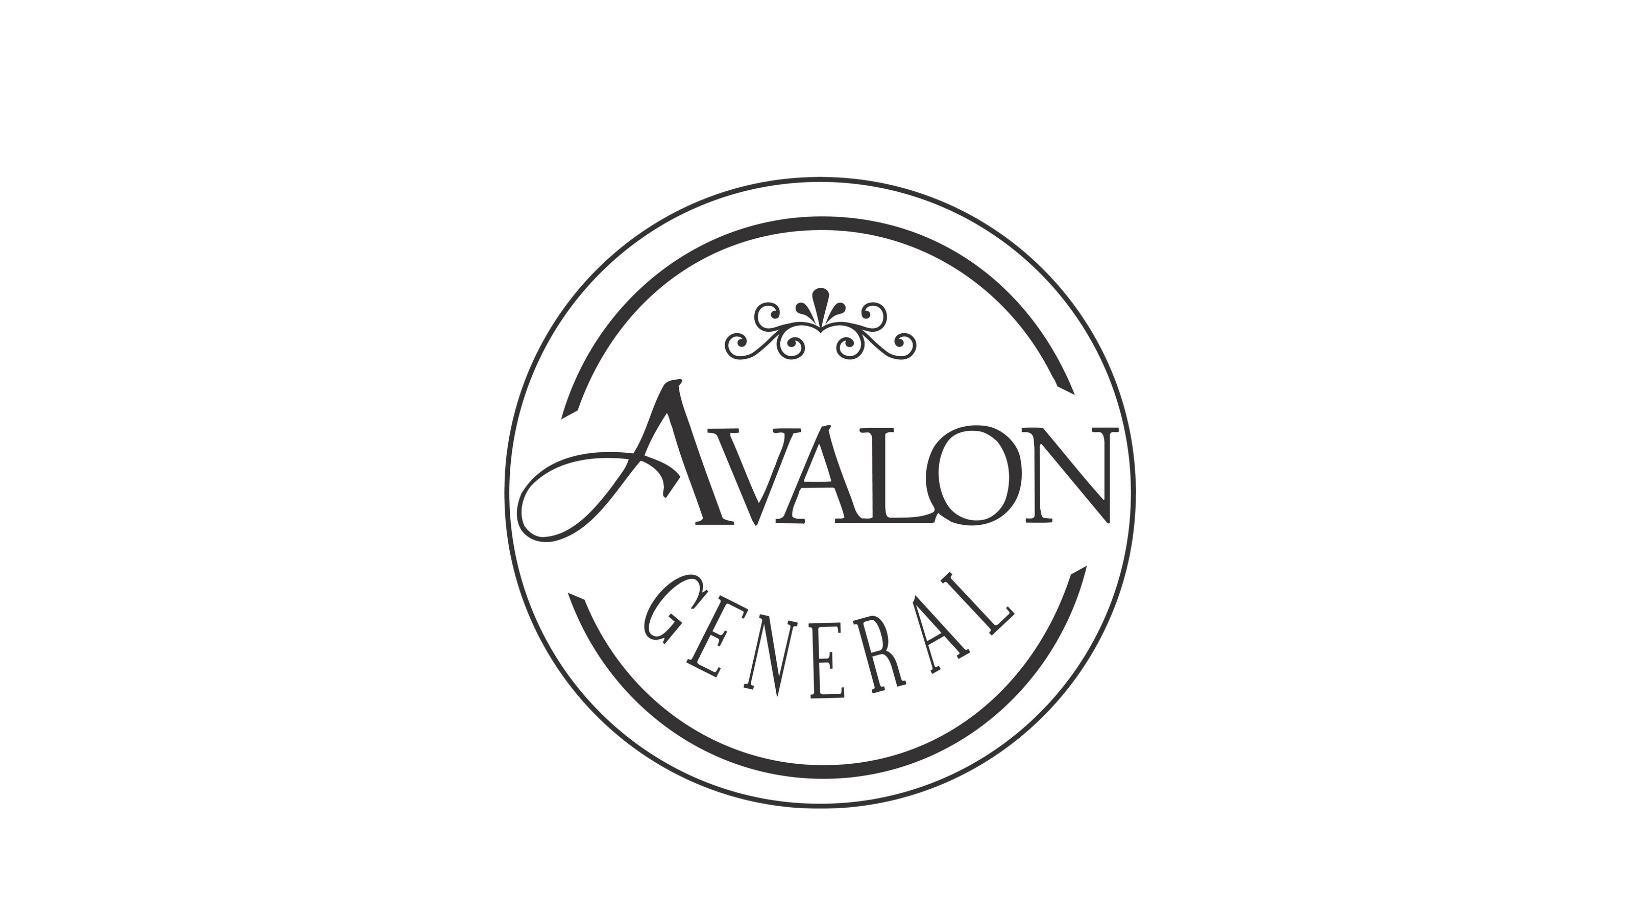 Avalon General